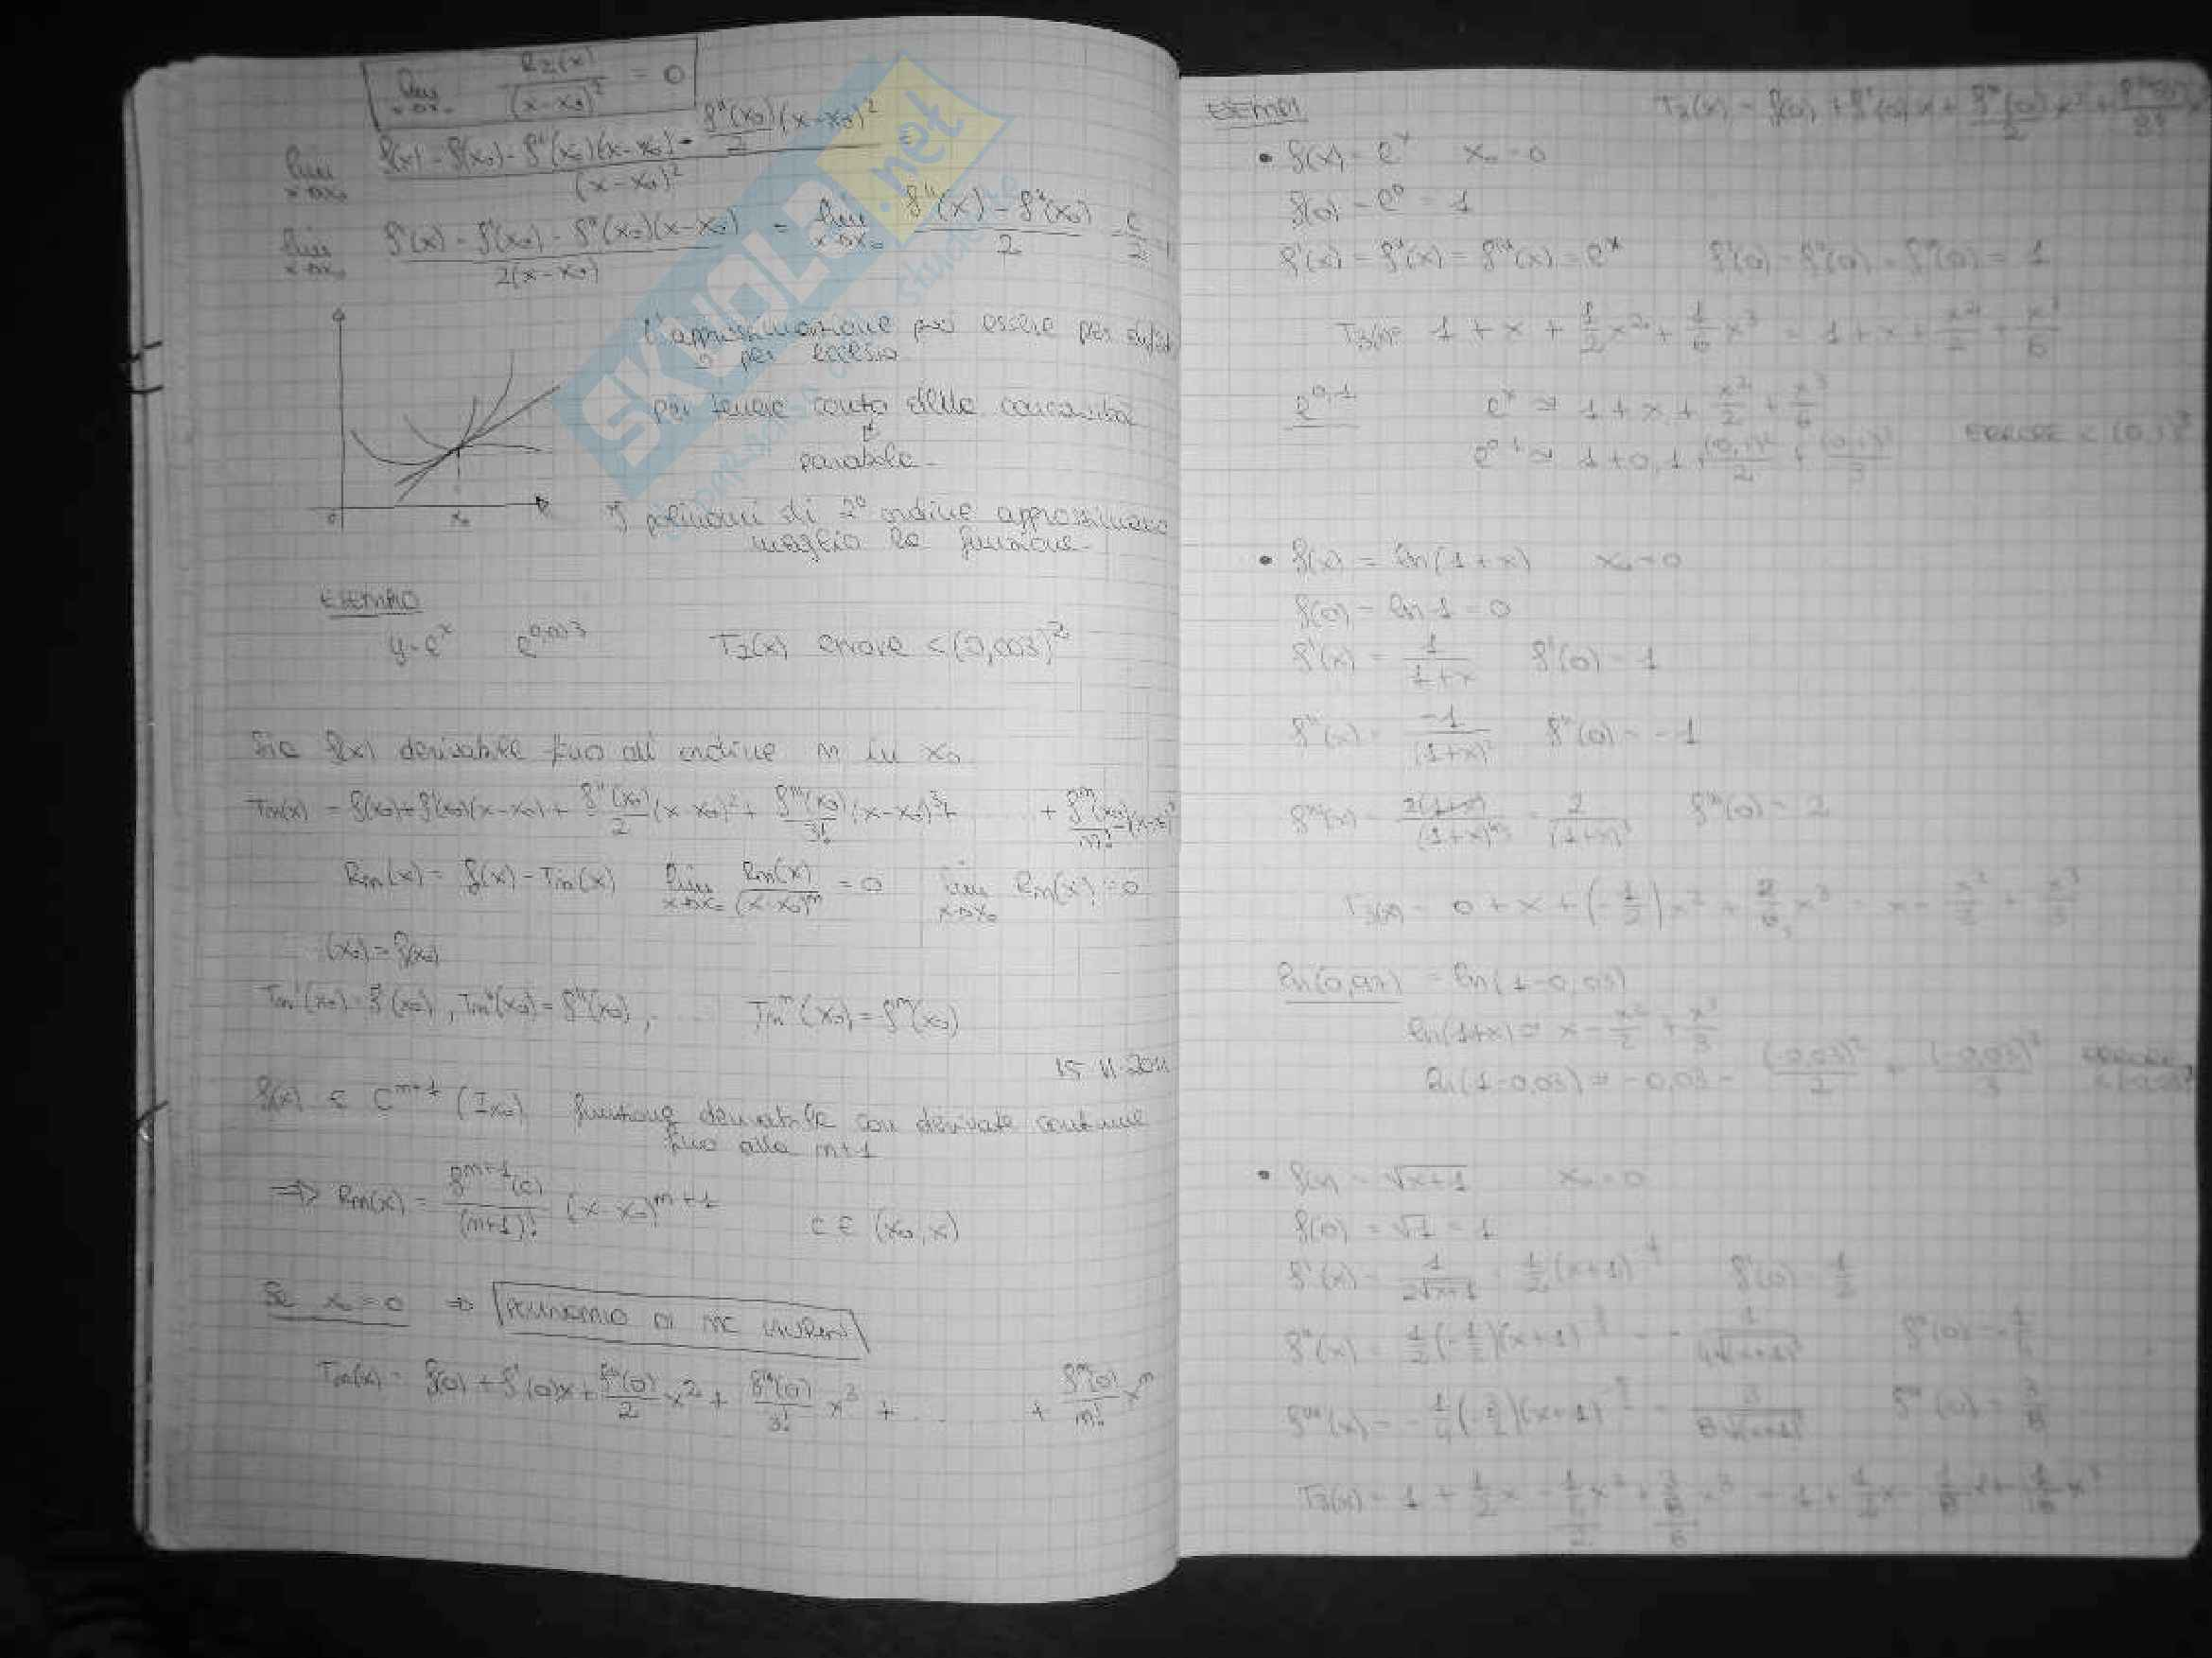 Matematica generale - parte 4 Pag. 6